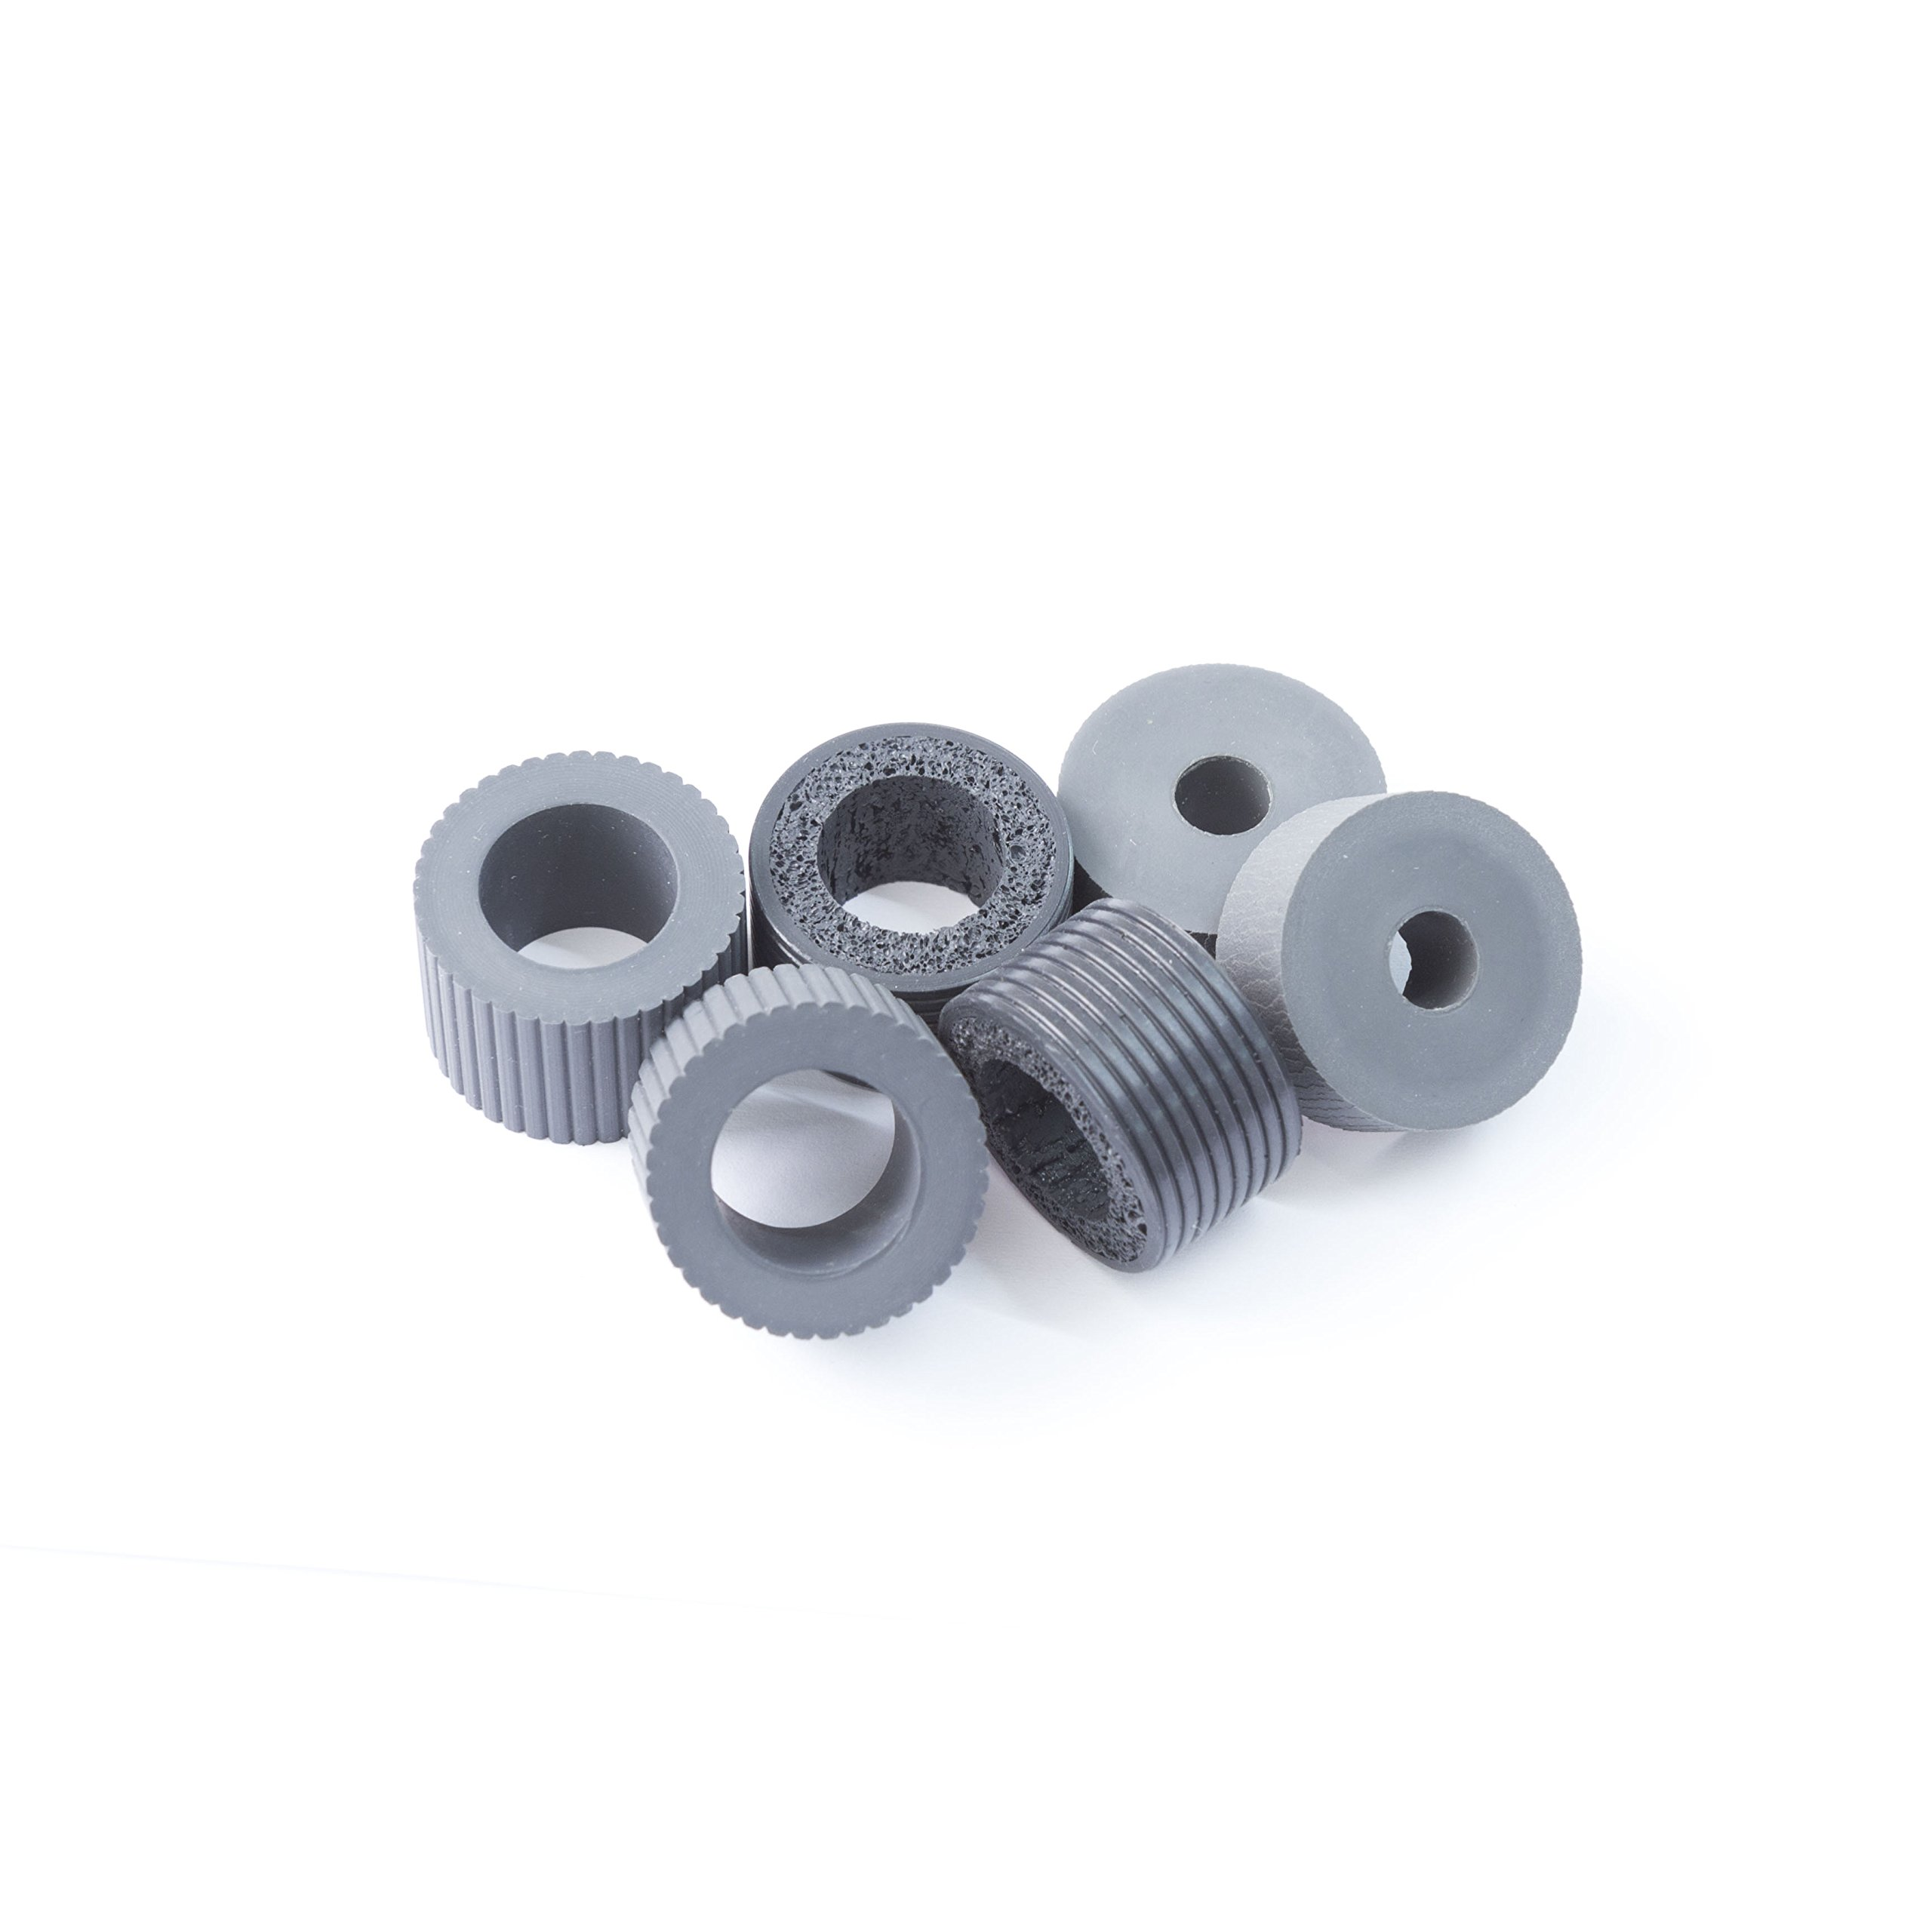 YANZEO PA03338-K011 PA03576-K010 Pick Roller Tire 6 Pcs/Set For Fujitsu FI-6670 Fi-6770 6770A 5650C FI-5650C FI-5750C 5750